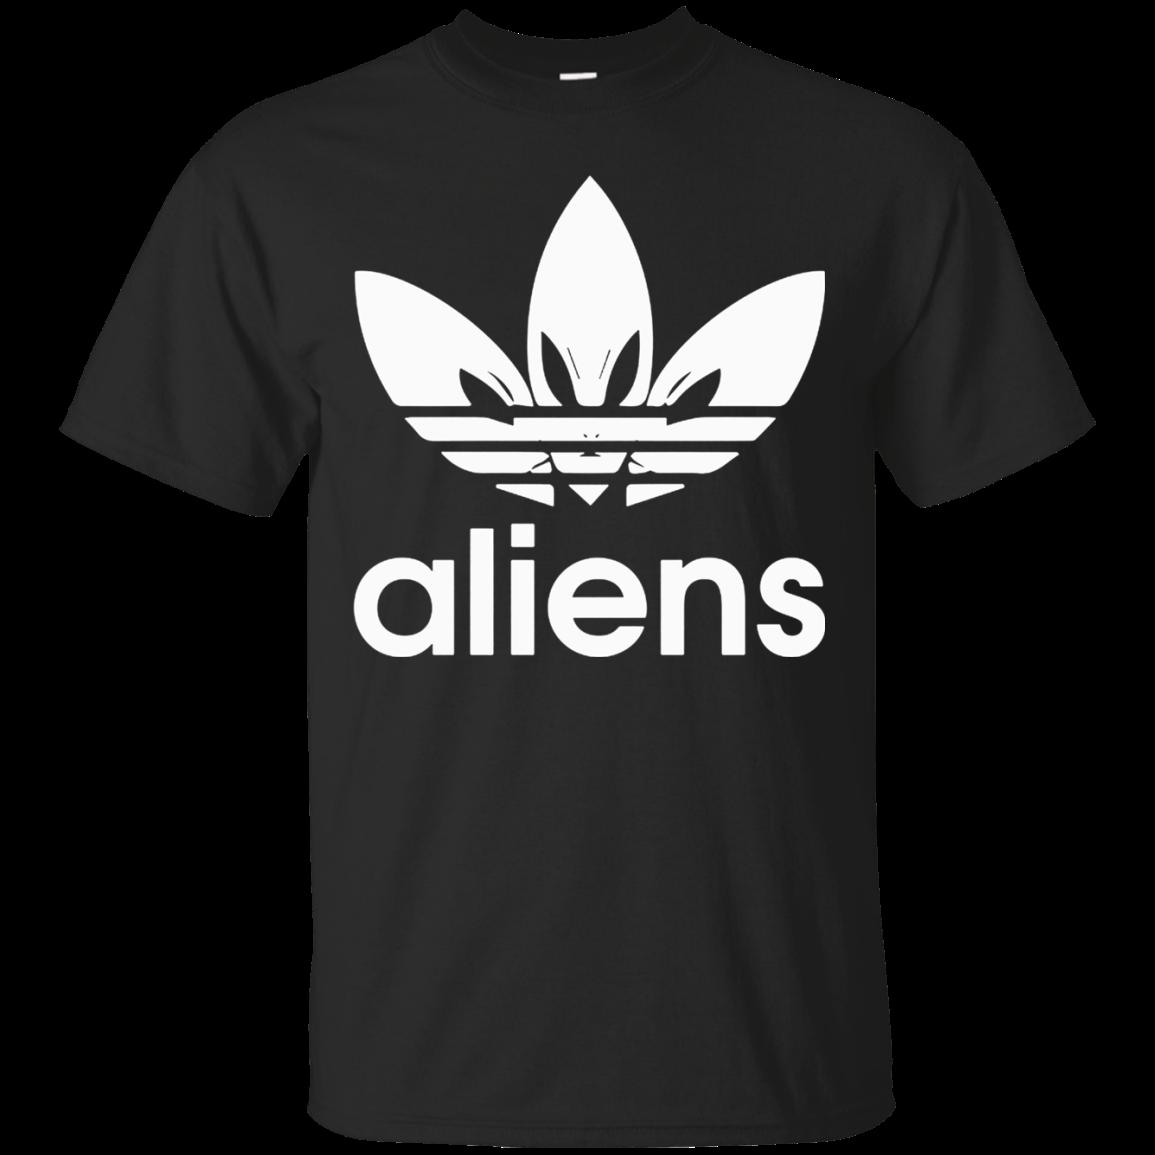 Aliens Adidas Shirt Cotton t shirt Men